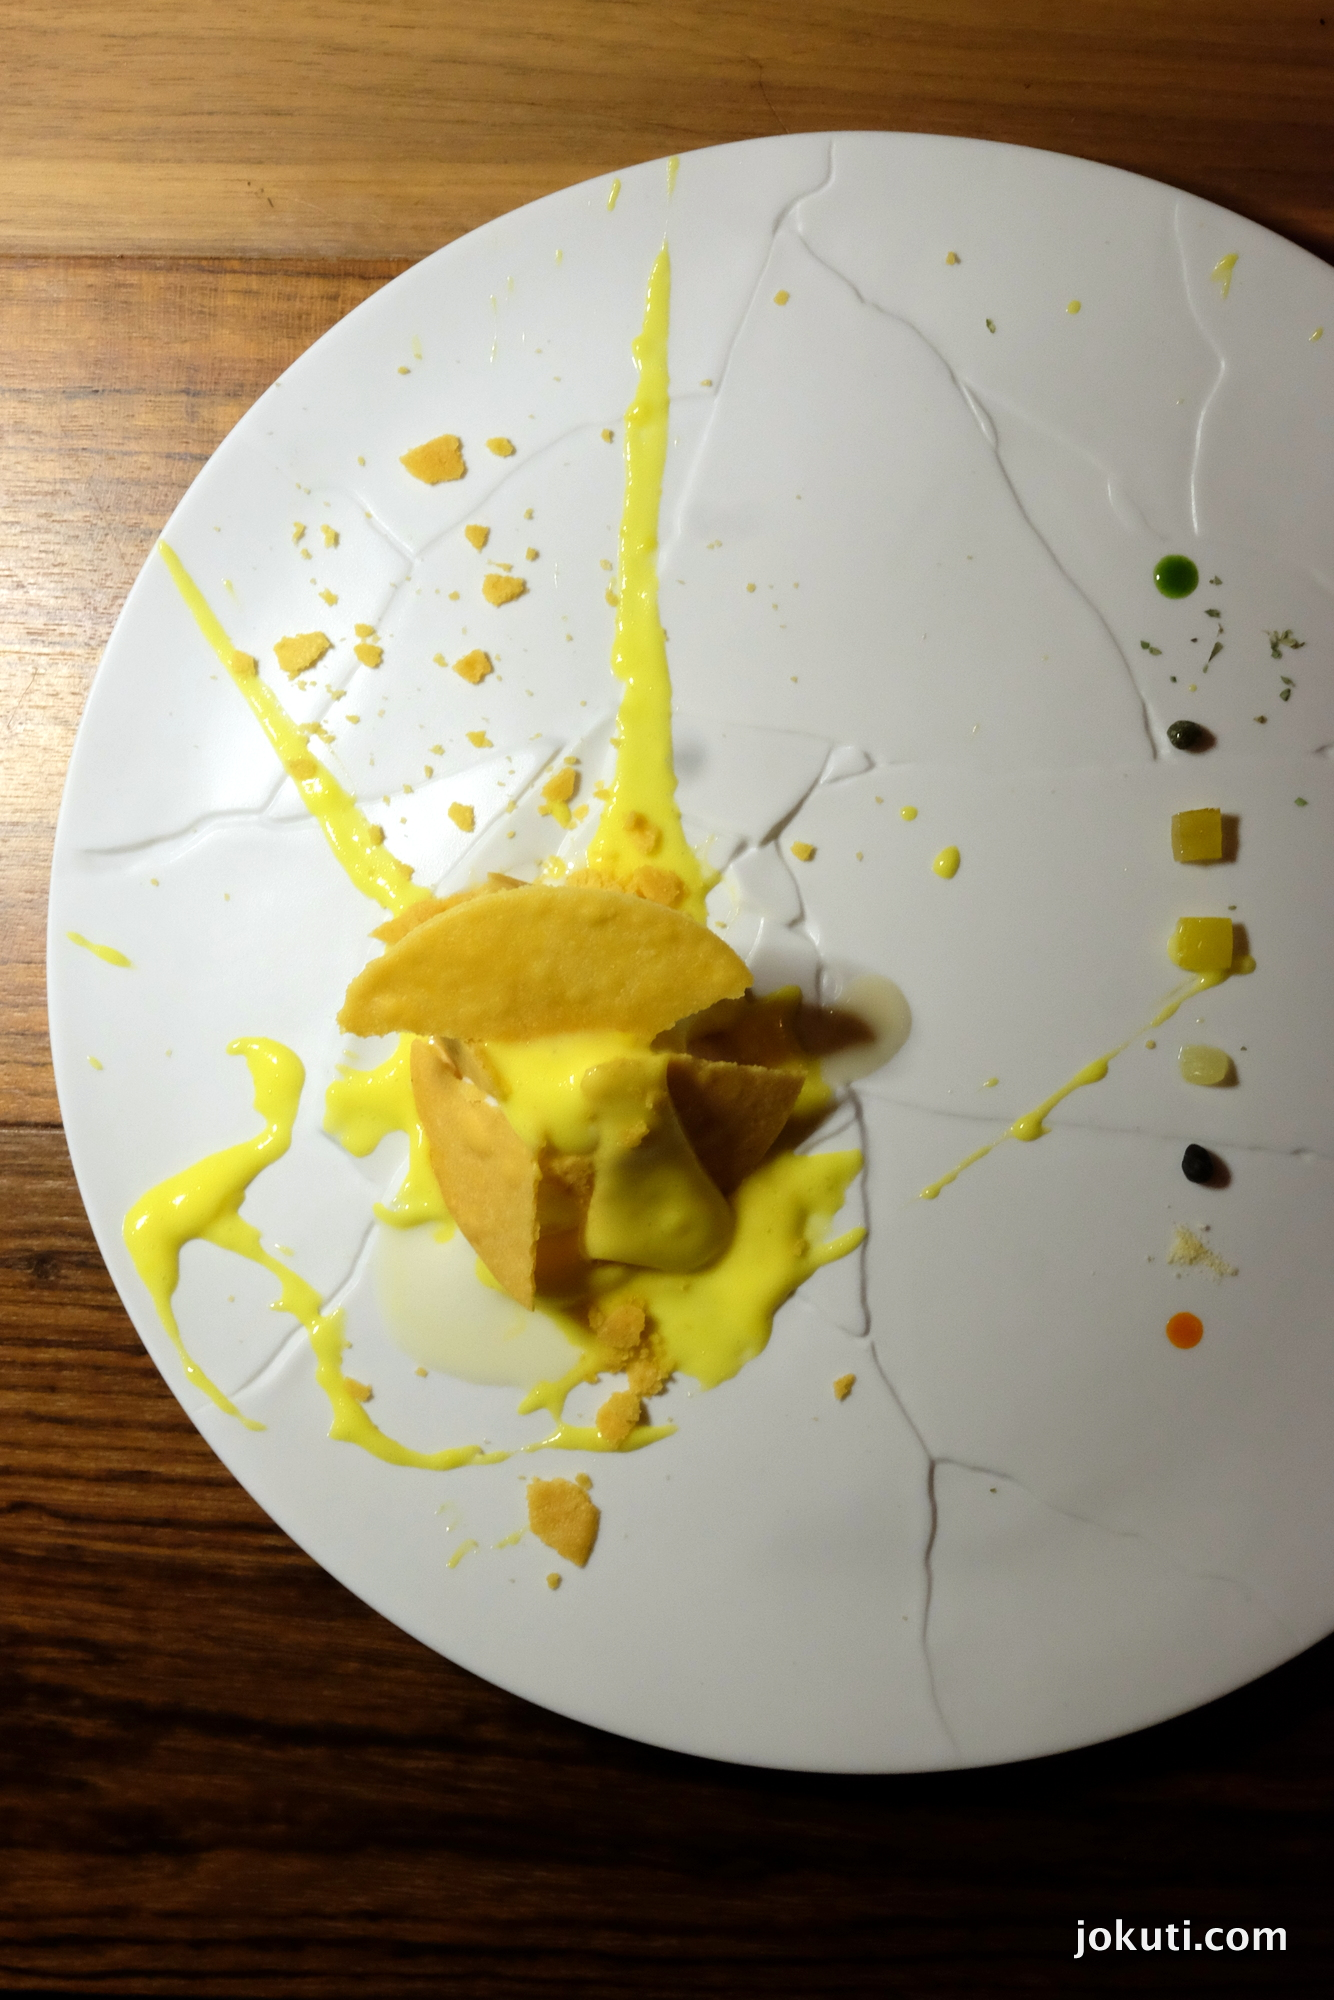 dscf5465_osteria_francescana_modena_italy_massimo_bottura_michelin_reitbauer_restaurant_vilagevo_jokuti.jpg